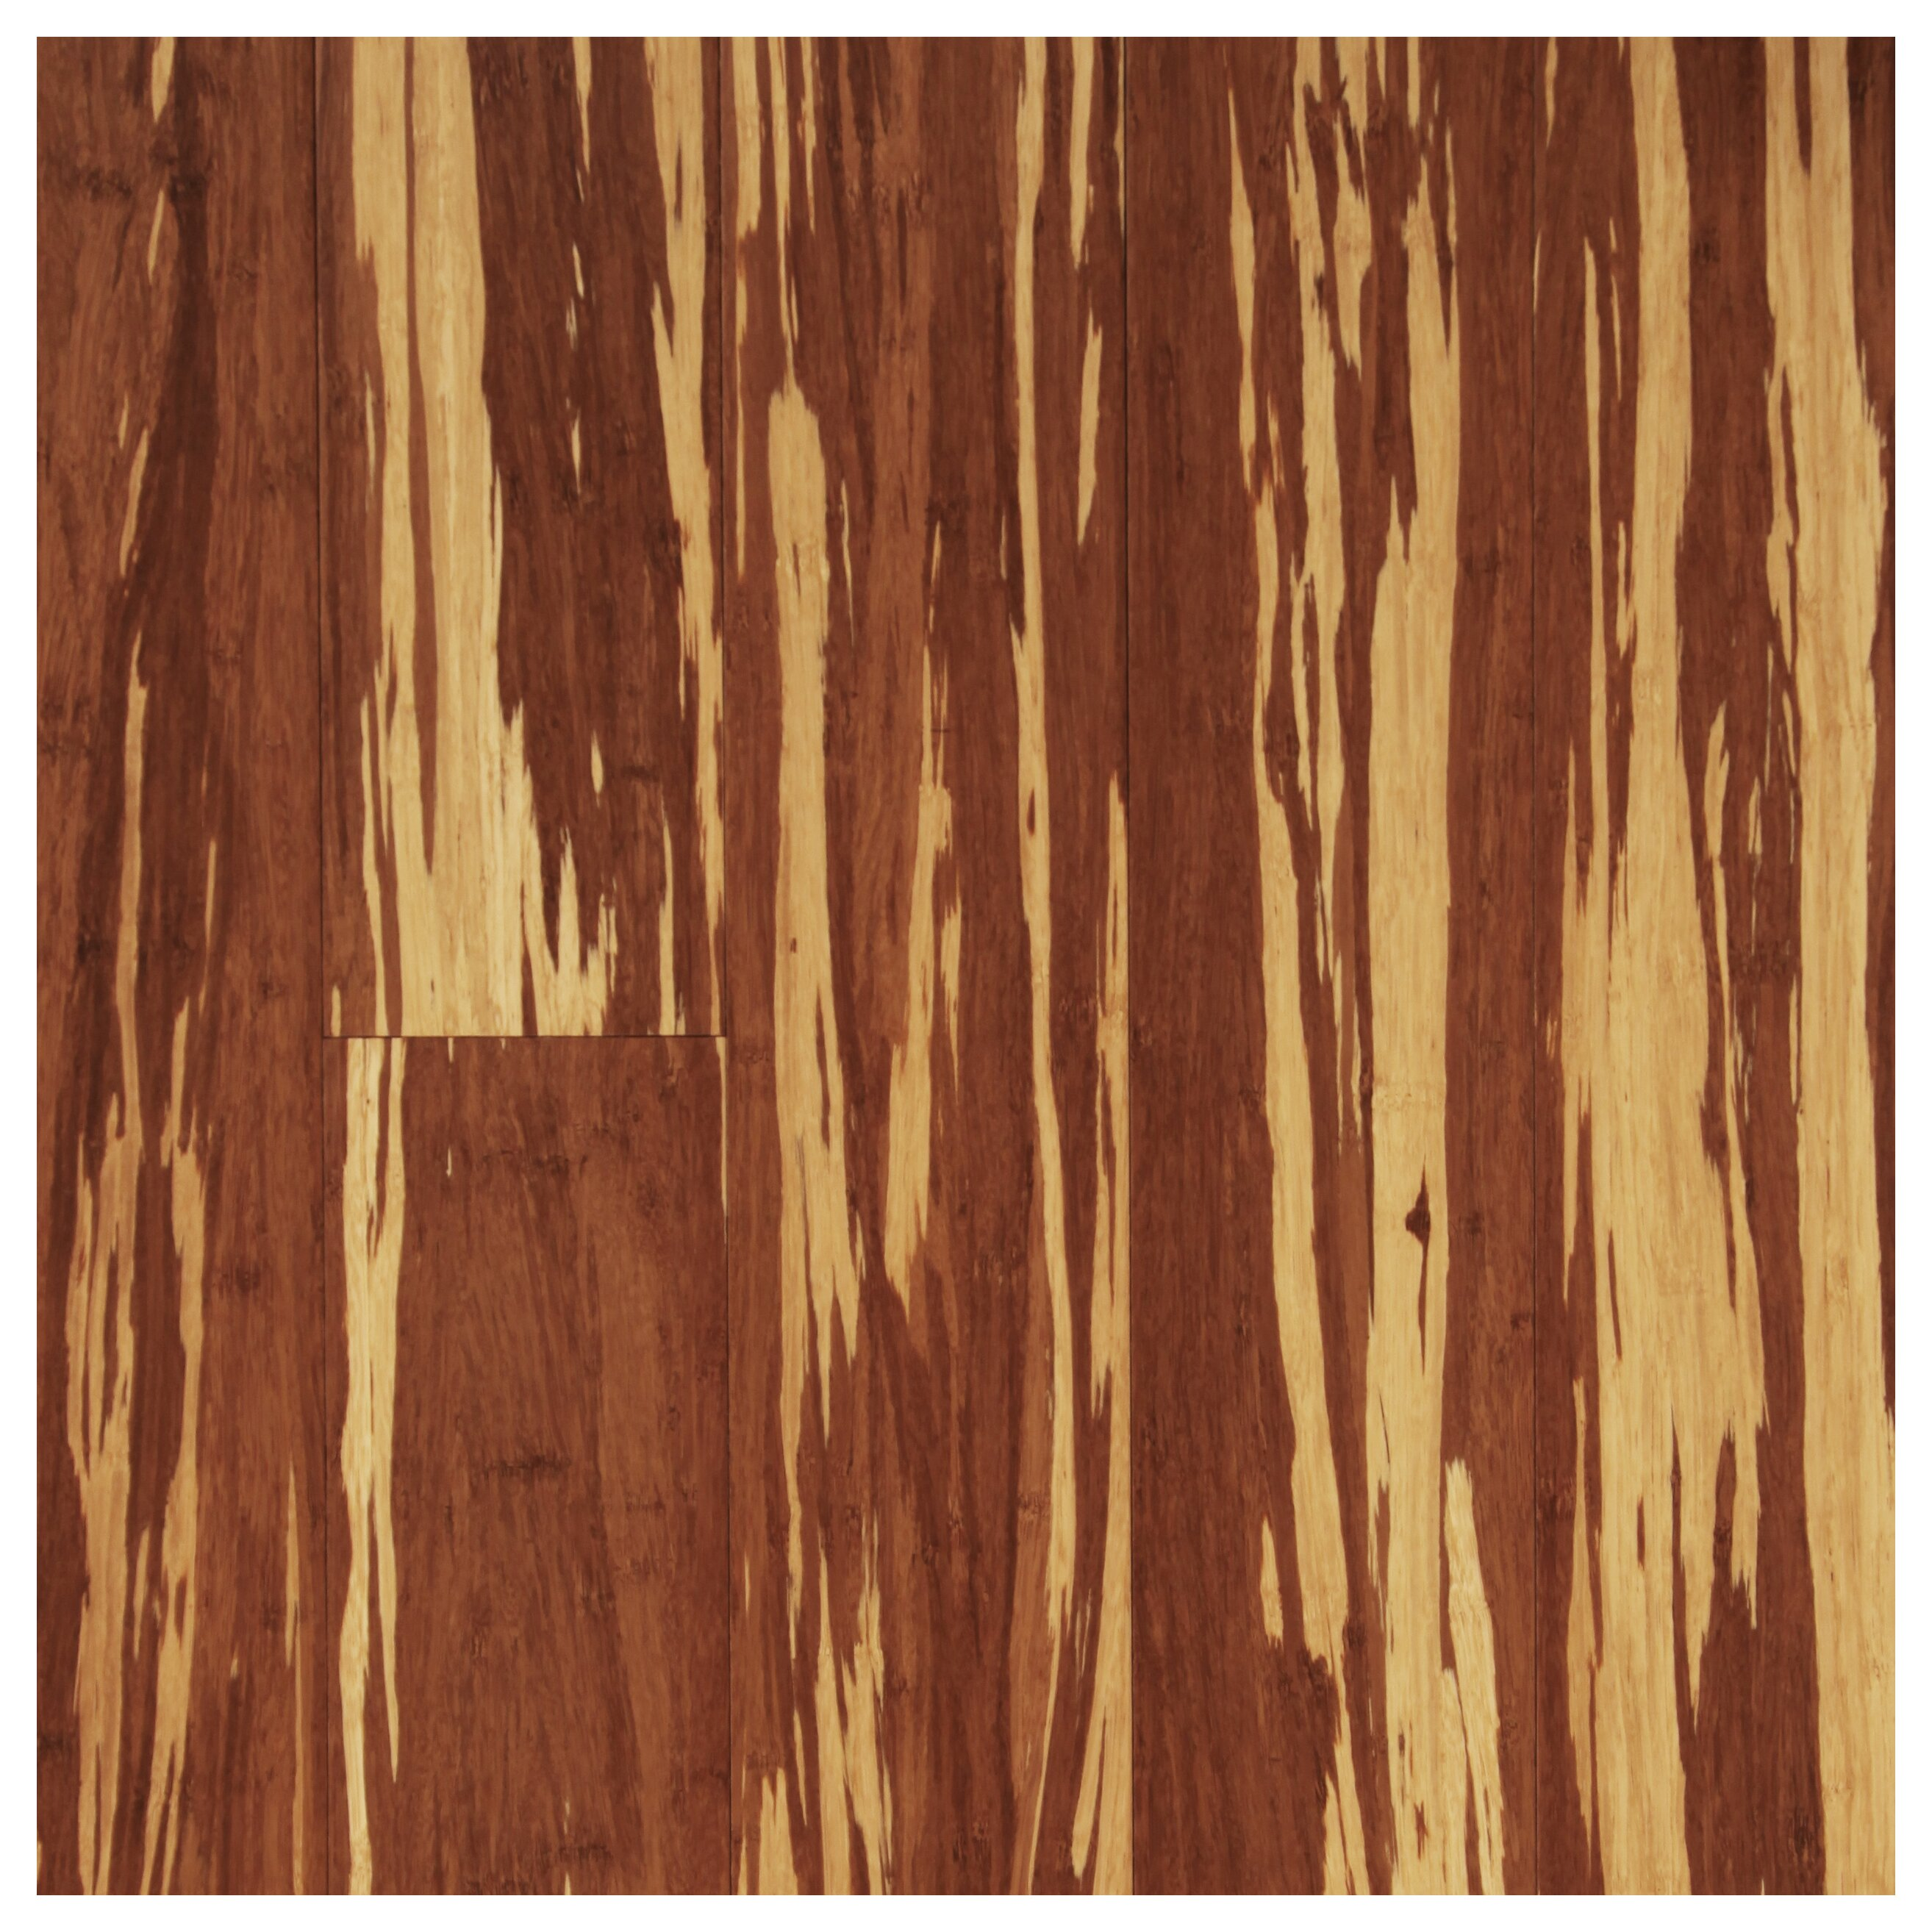 Easoon Usa 4 3 4 Quot Solid Strand Woven Bamboo Hardwood